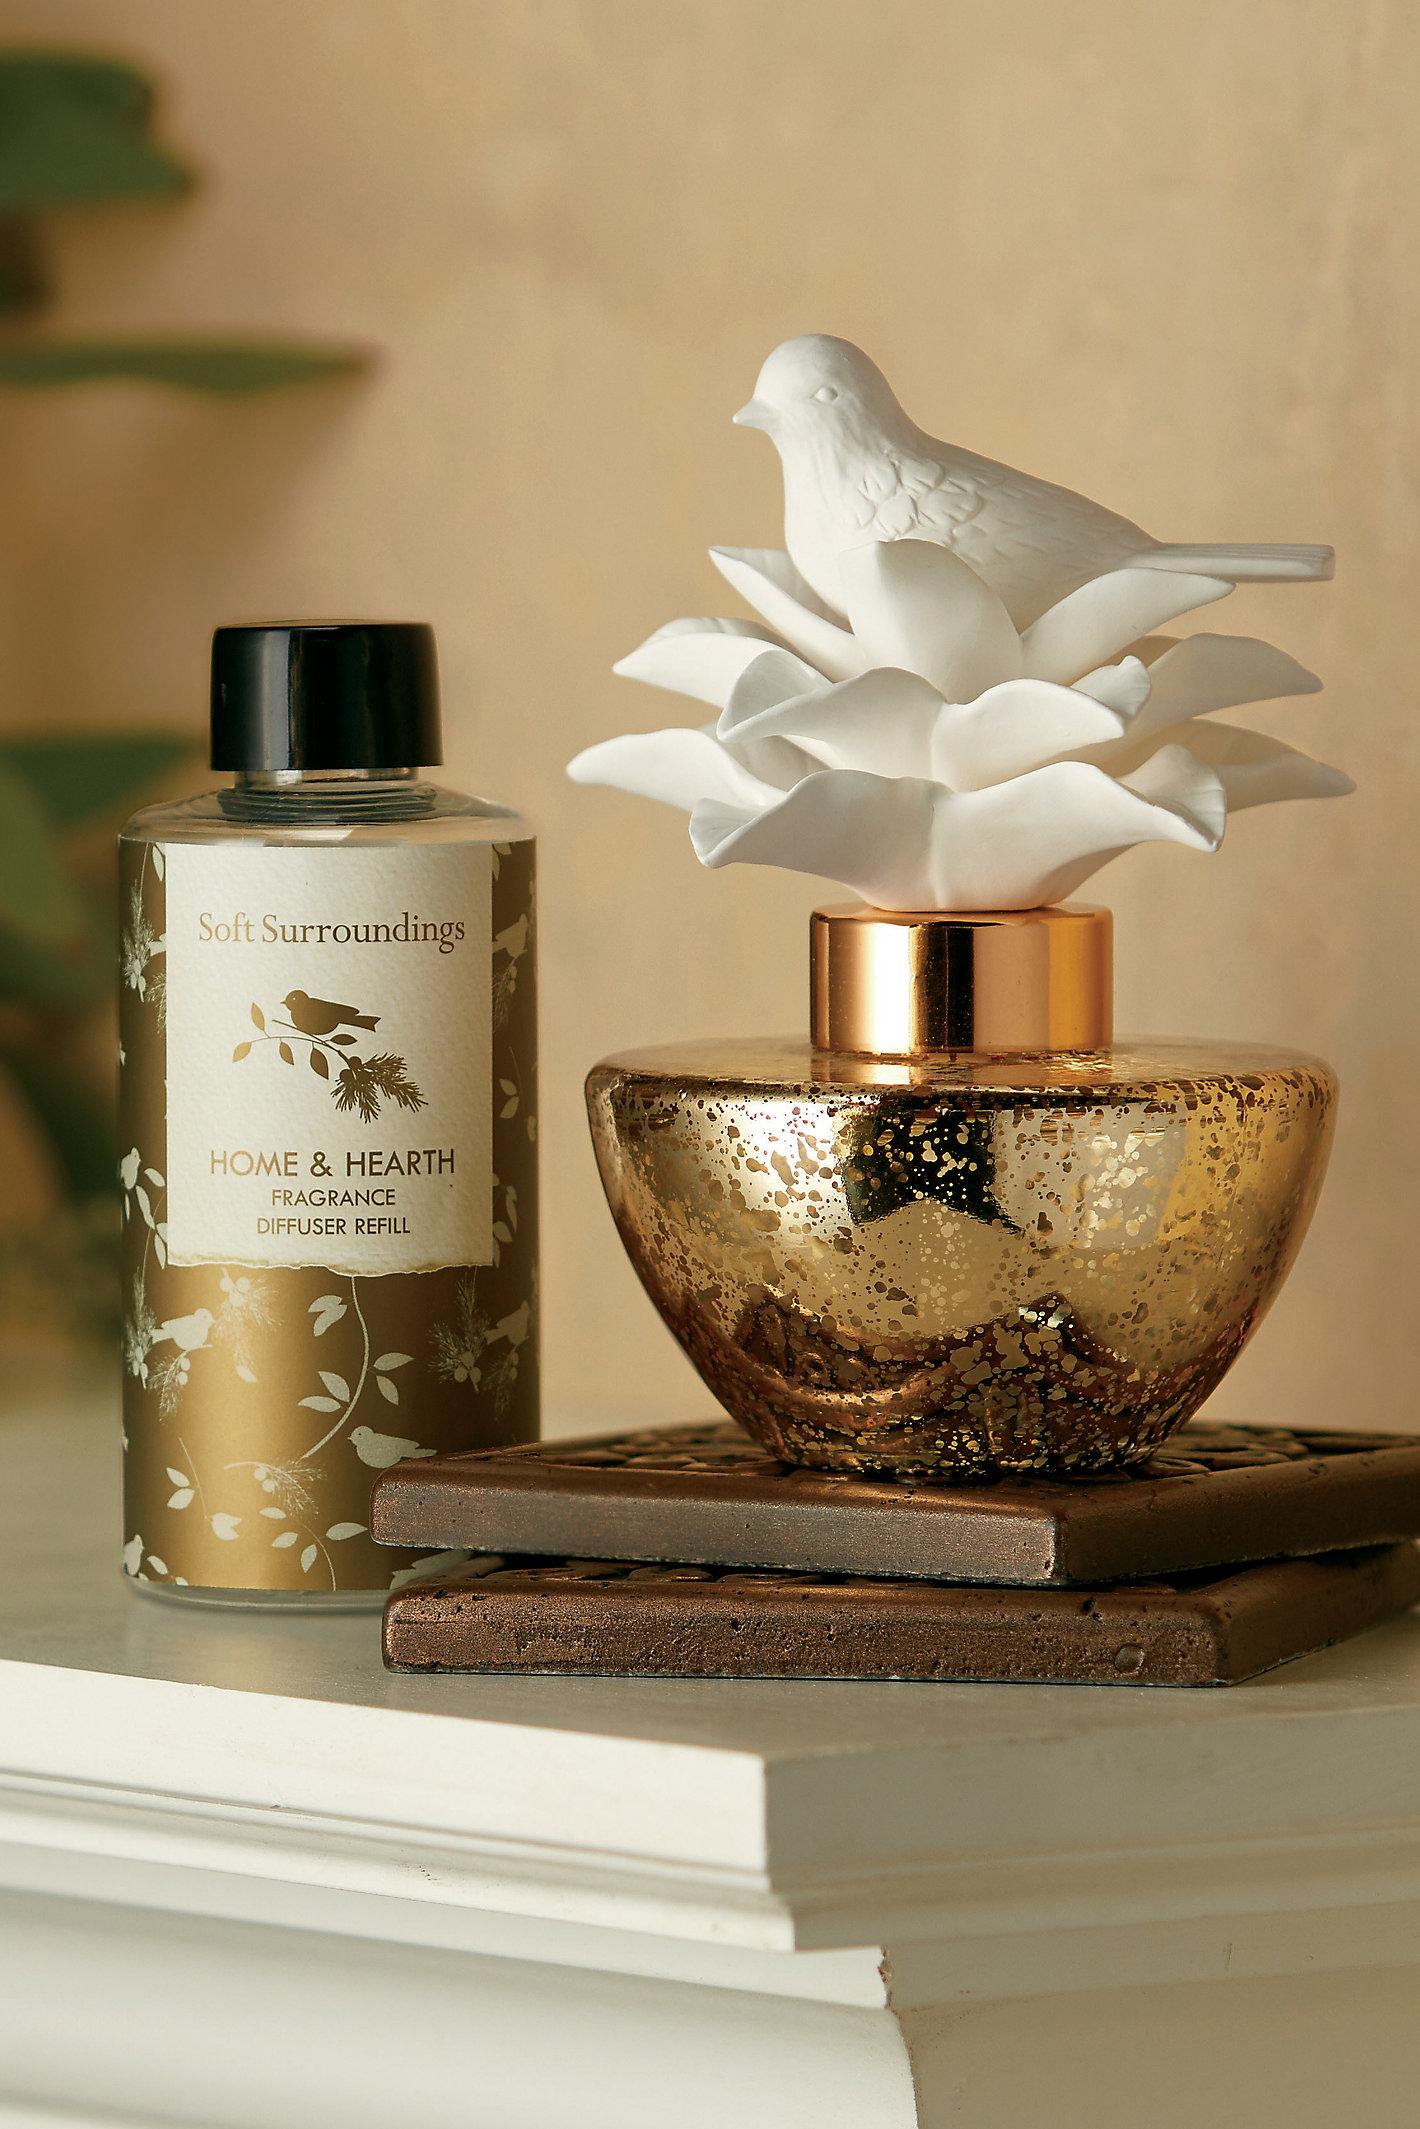 Home & Hearth Fragrance Diffuser & Refill Set